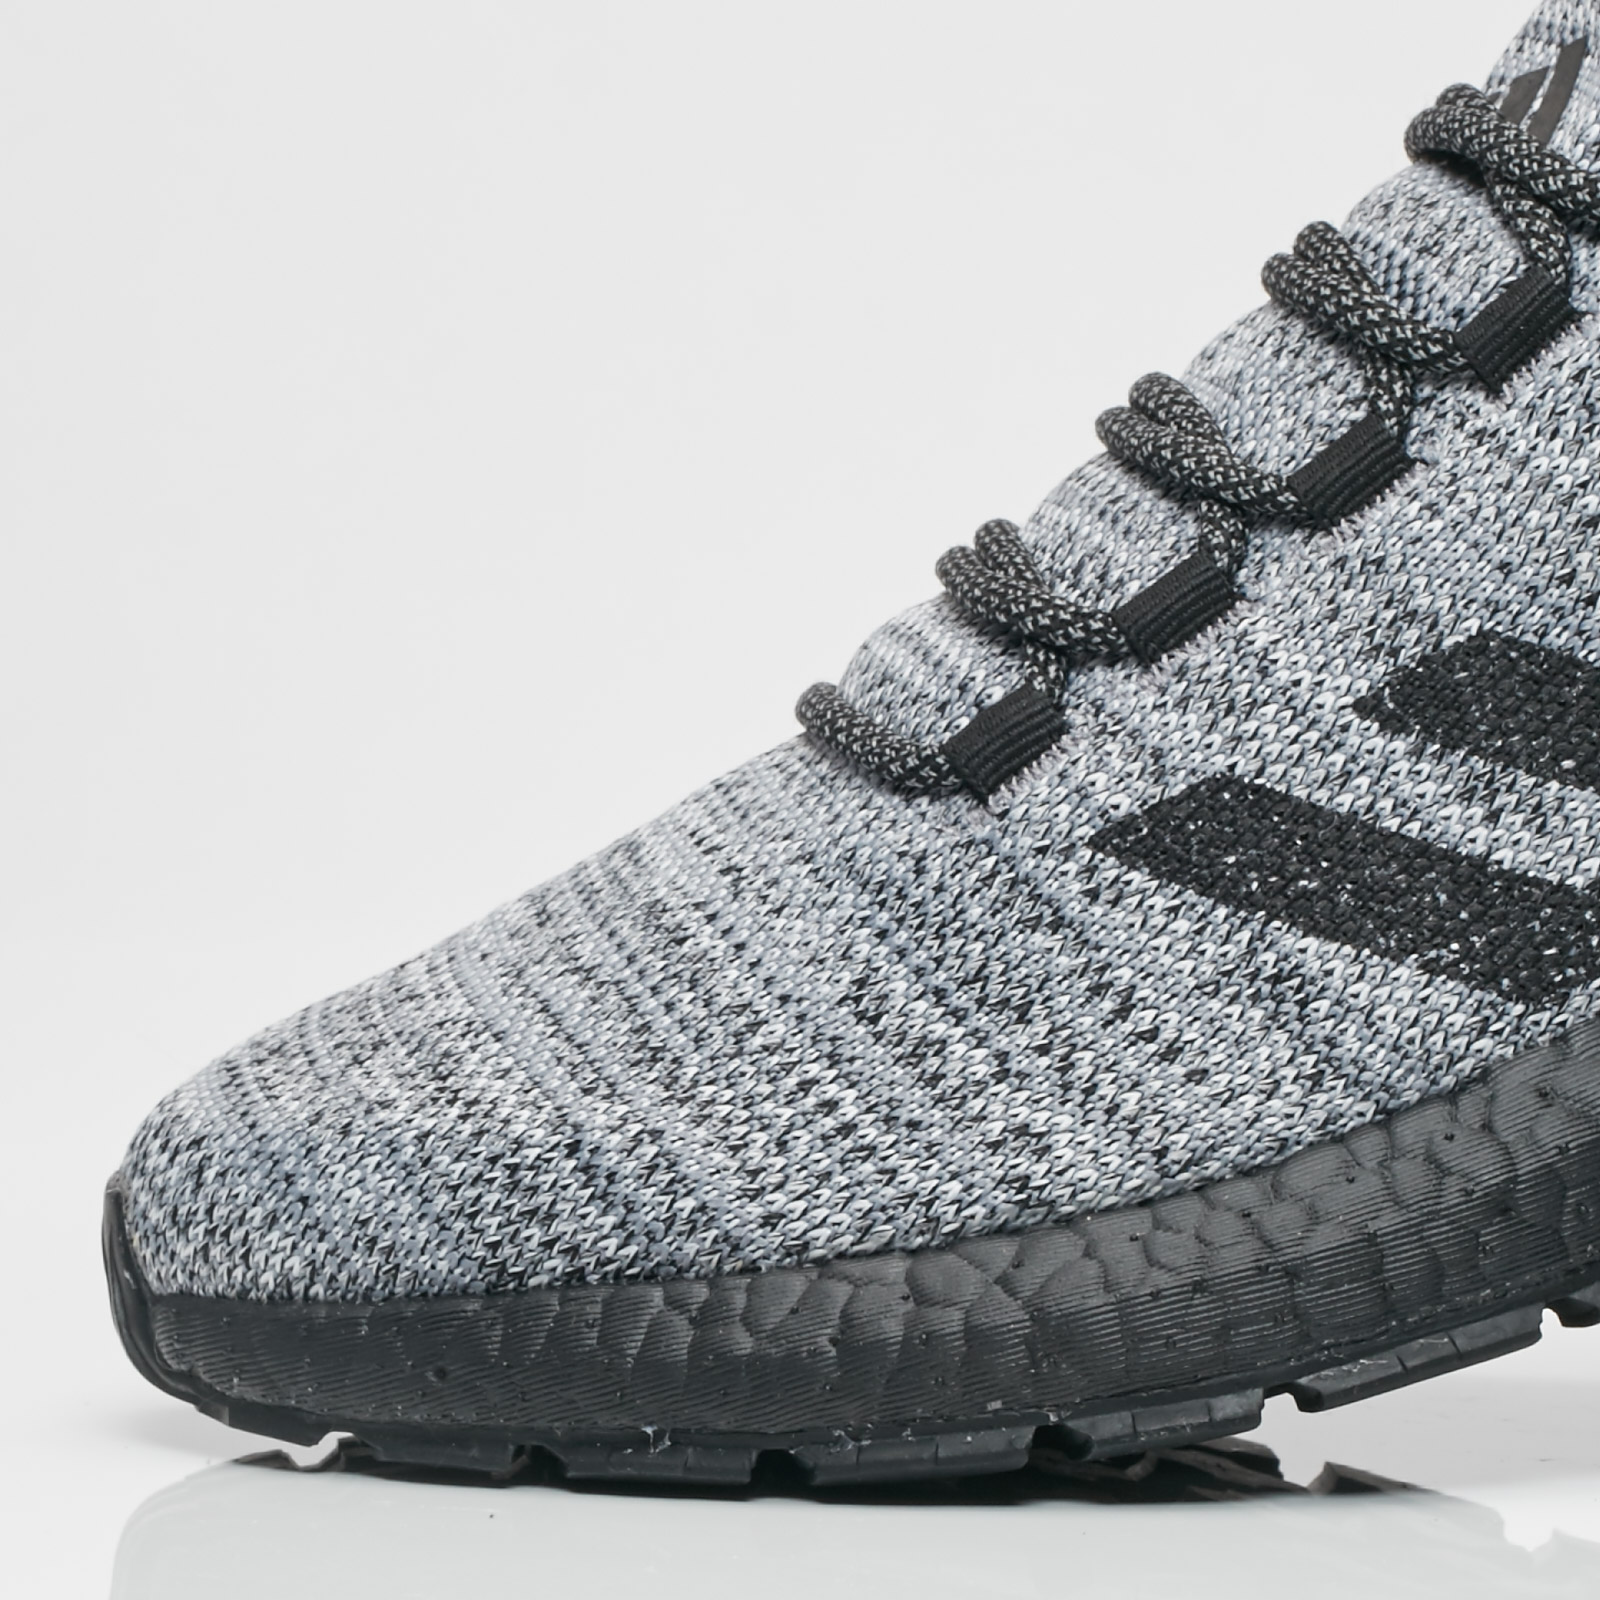 c78884e21b6 adidas Pure Boost All Terrain - Cg2989 - Sneakersnstuff